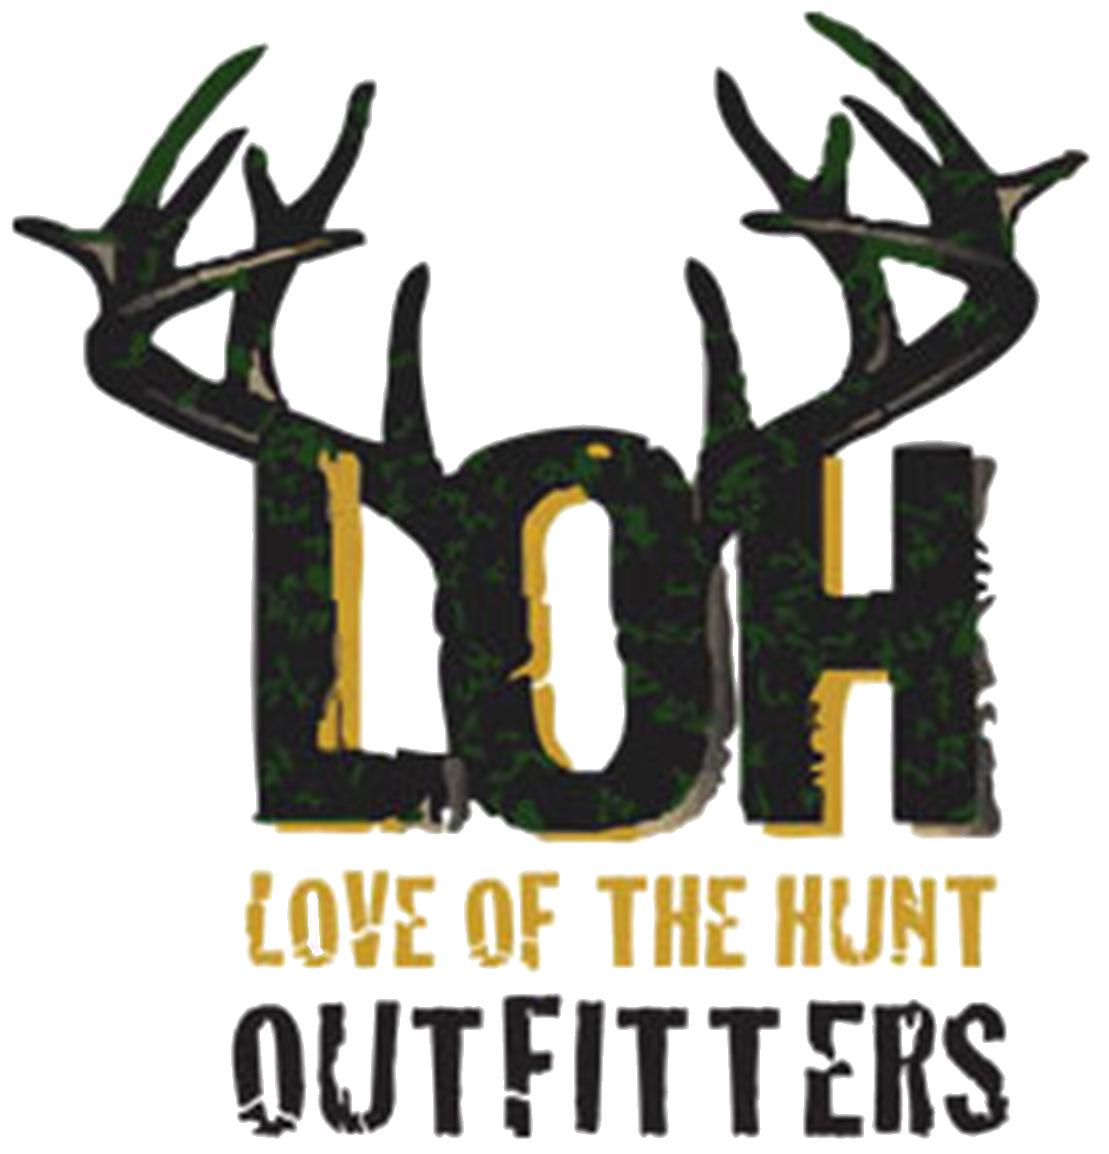 LOH-logo no background.png